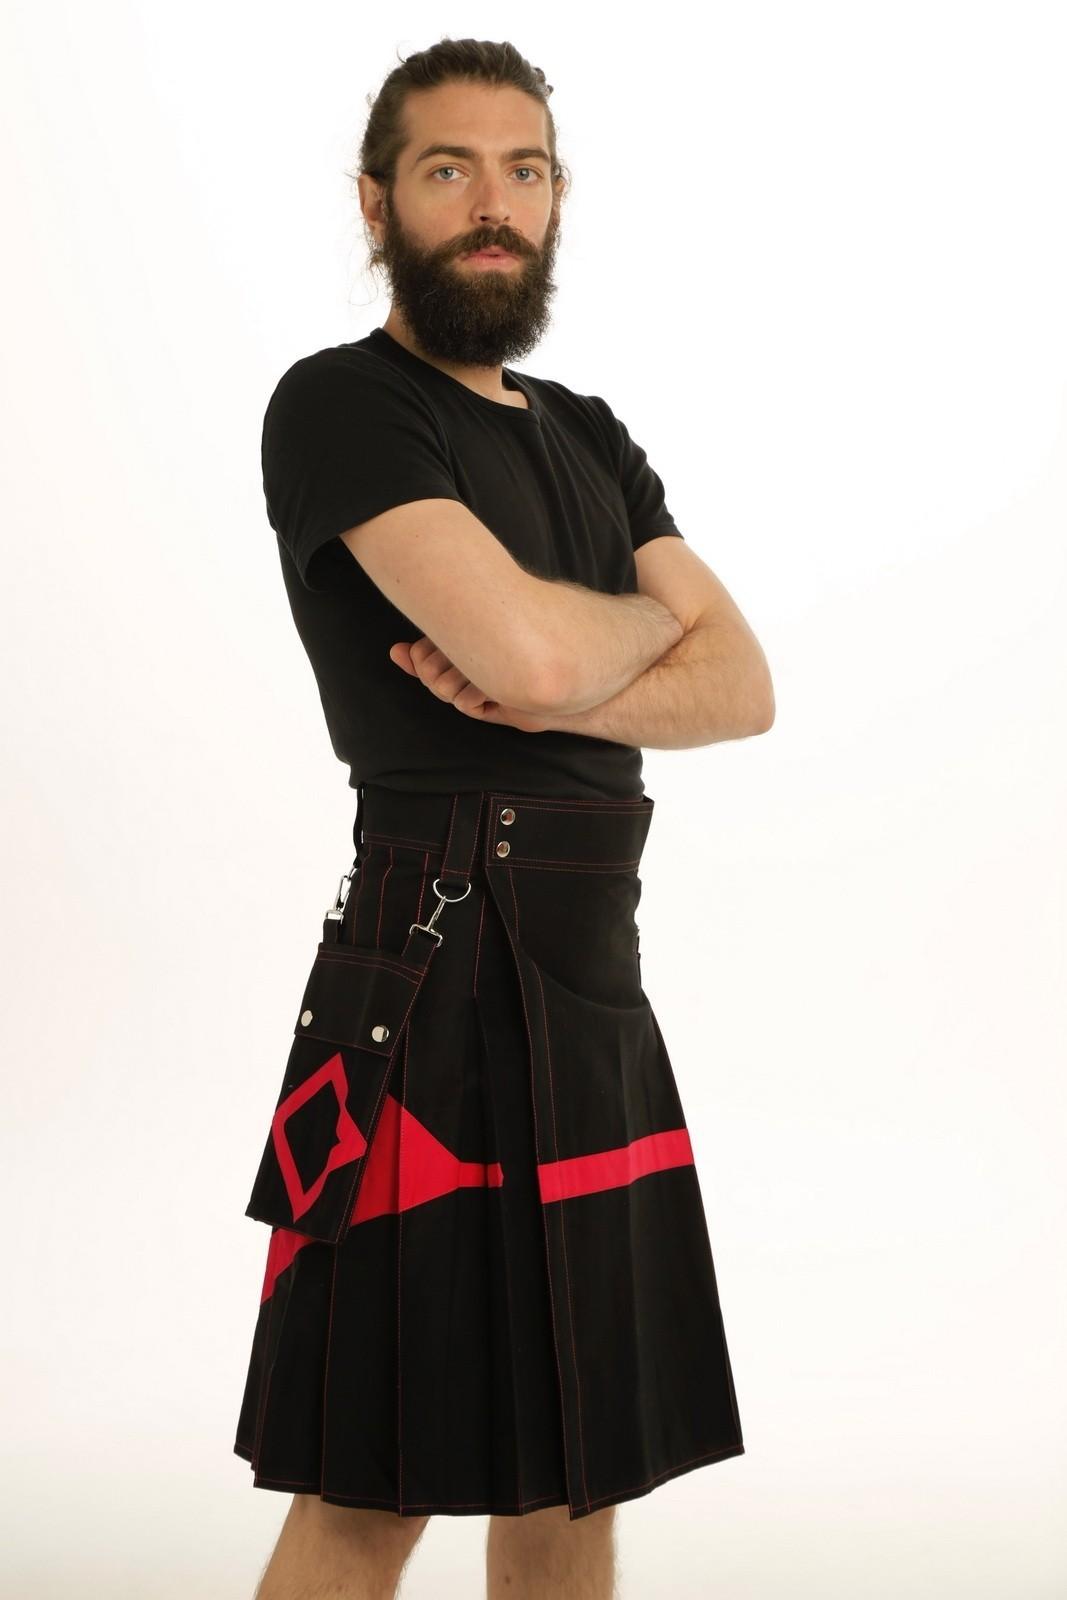 Diamond Black Utility Kilt with Detachable Pockets